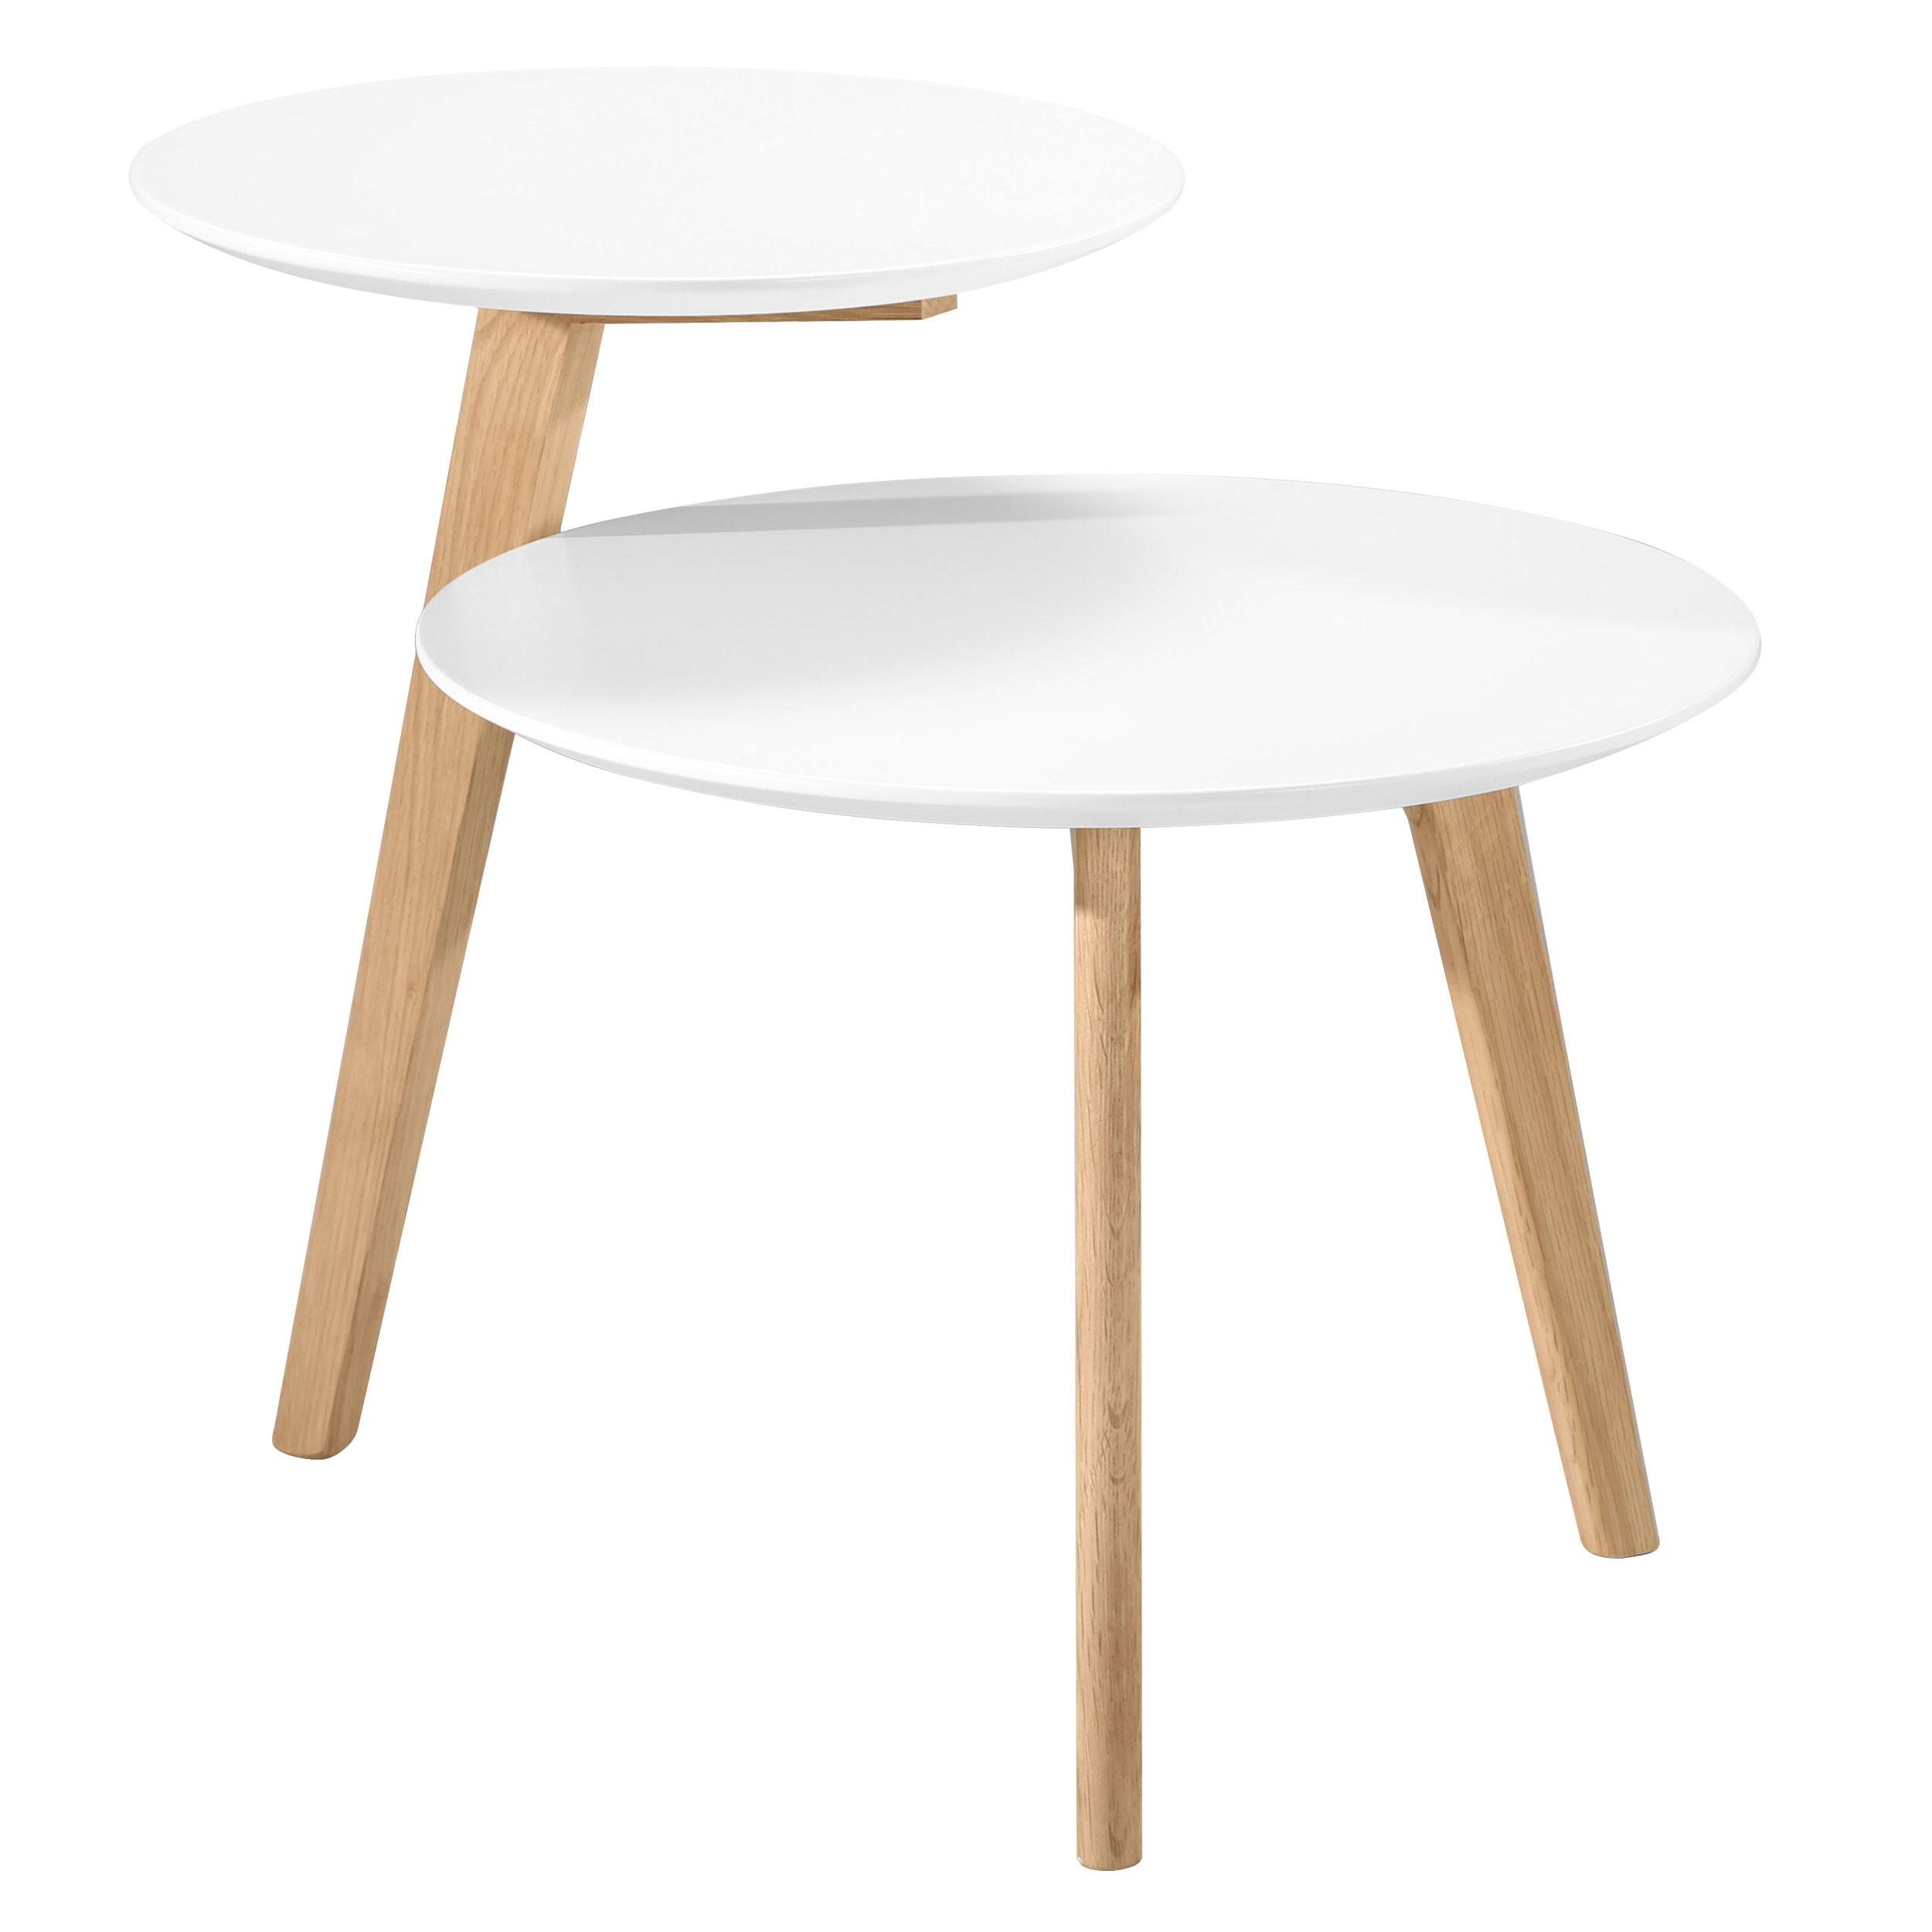 table basse ronde assak commandez les tables basses ronde assak design rdv d co. Black Bedroom Furniture Sets. Home Design Ideas